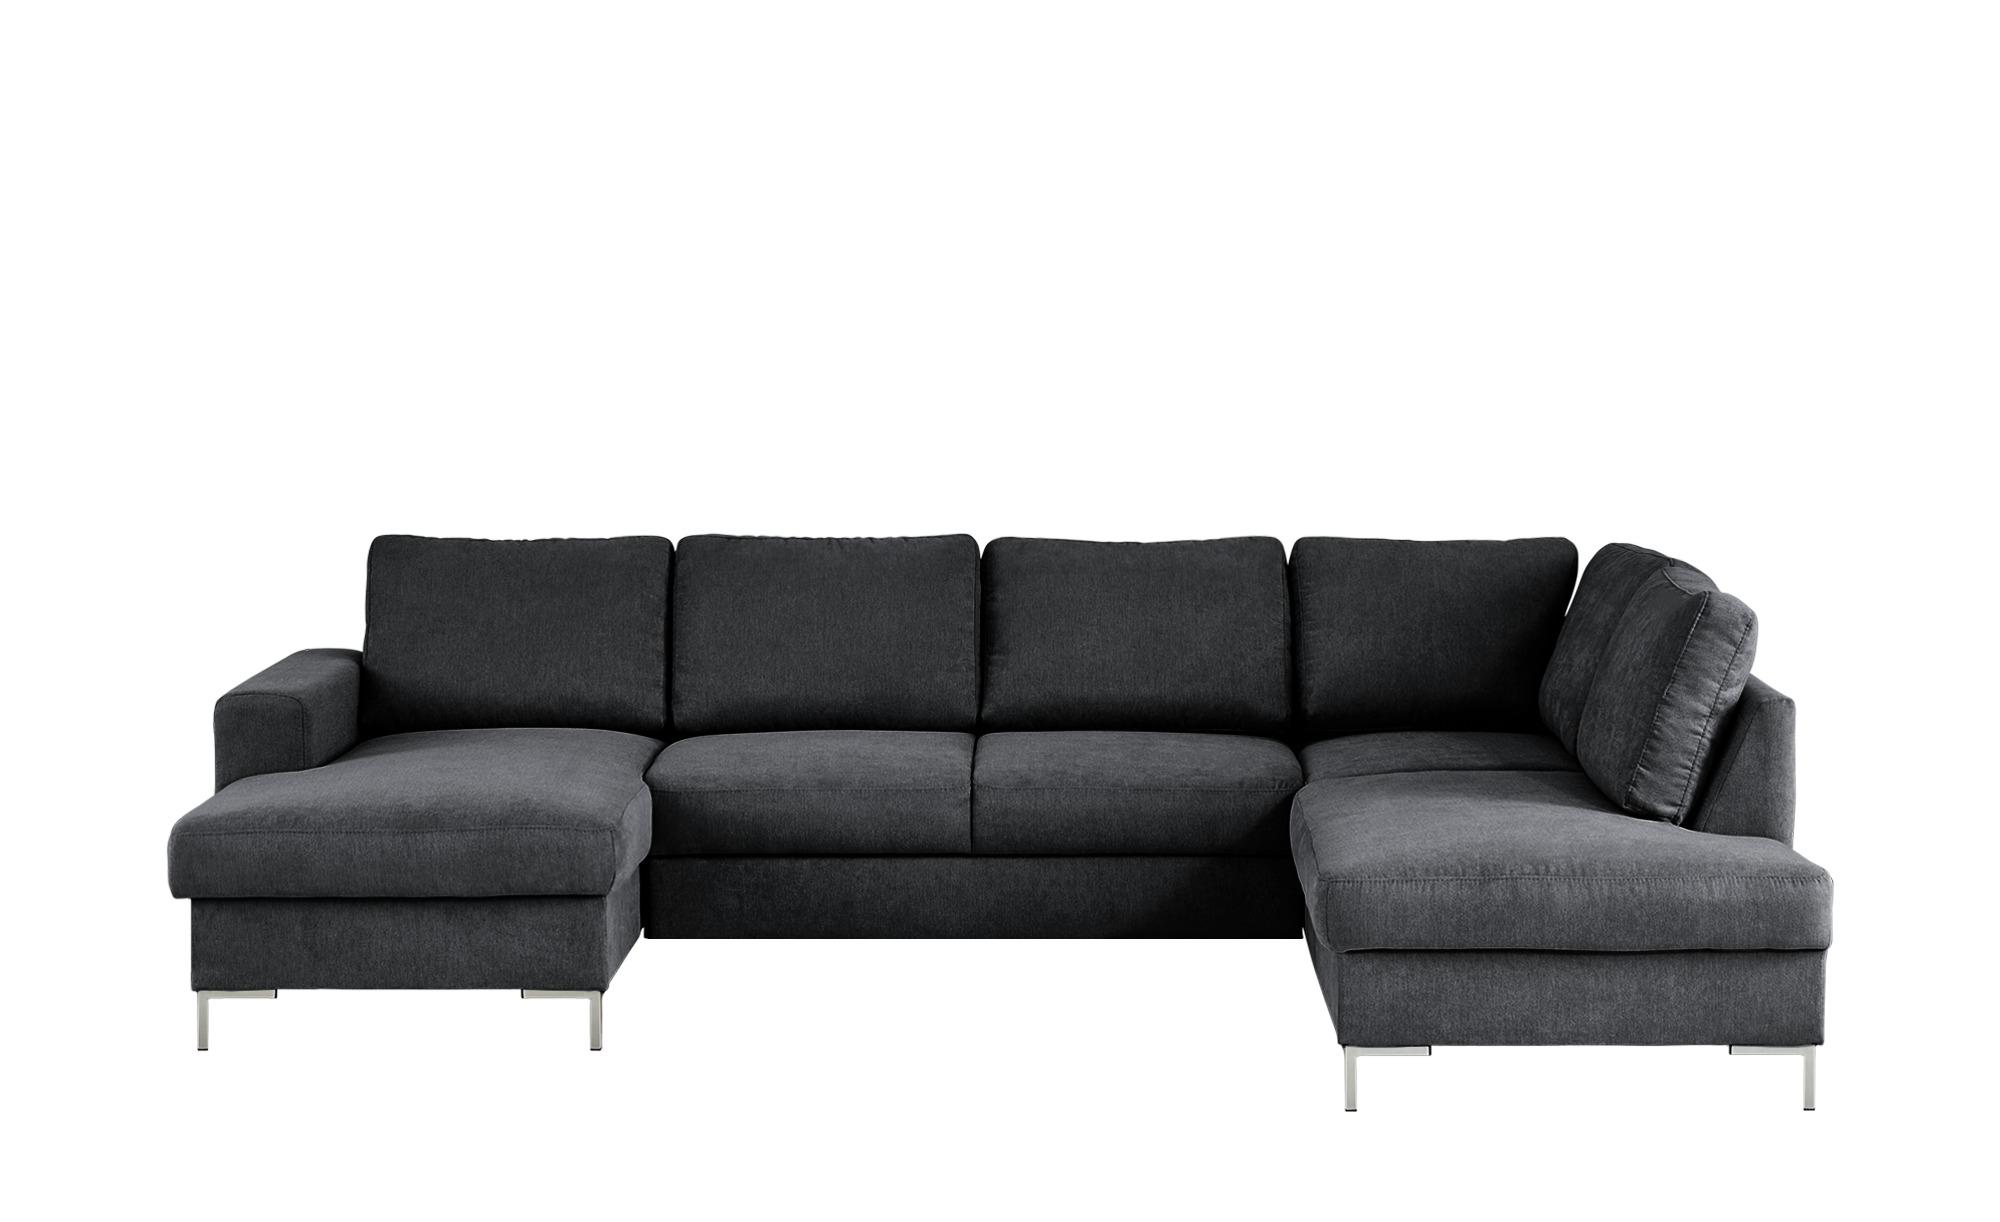 uno wohnlandschaft lilly breite h he 84 cm grau online. Black Bedroom Furniture Sets. Home Design Ideas